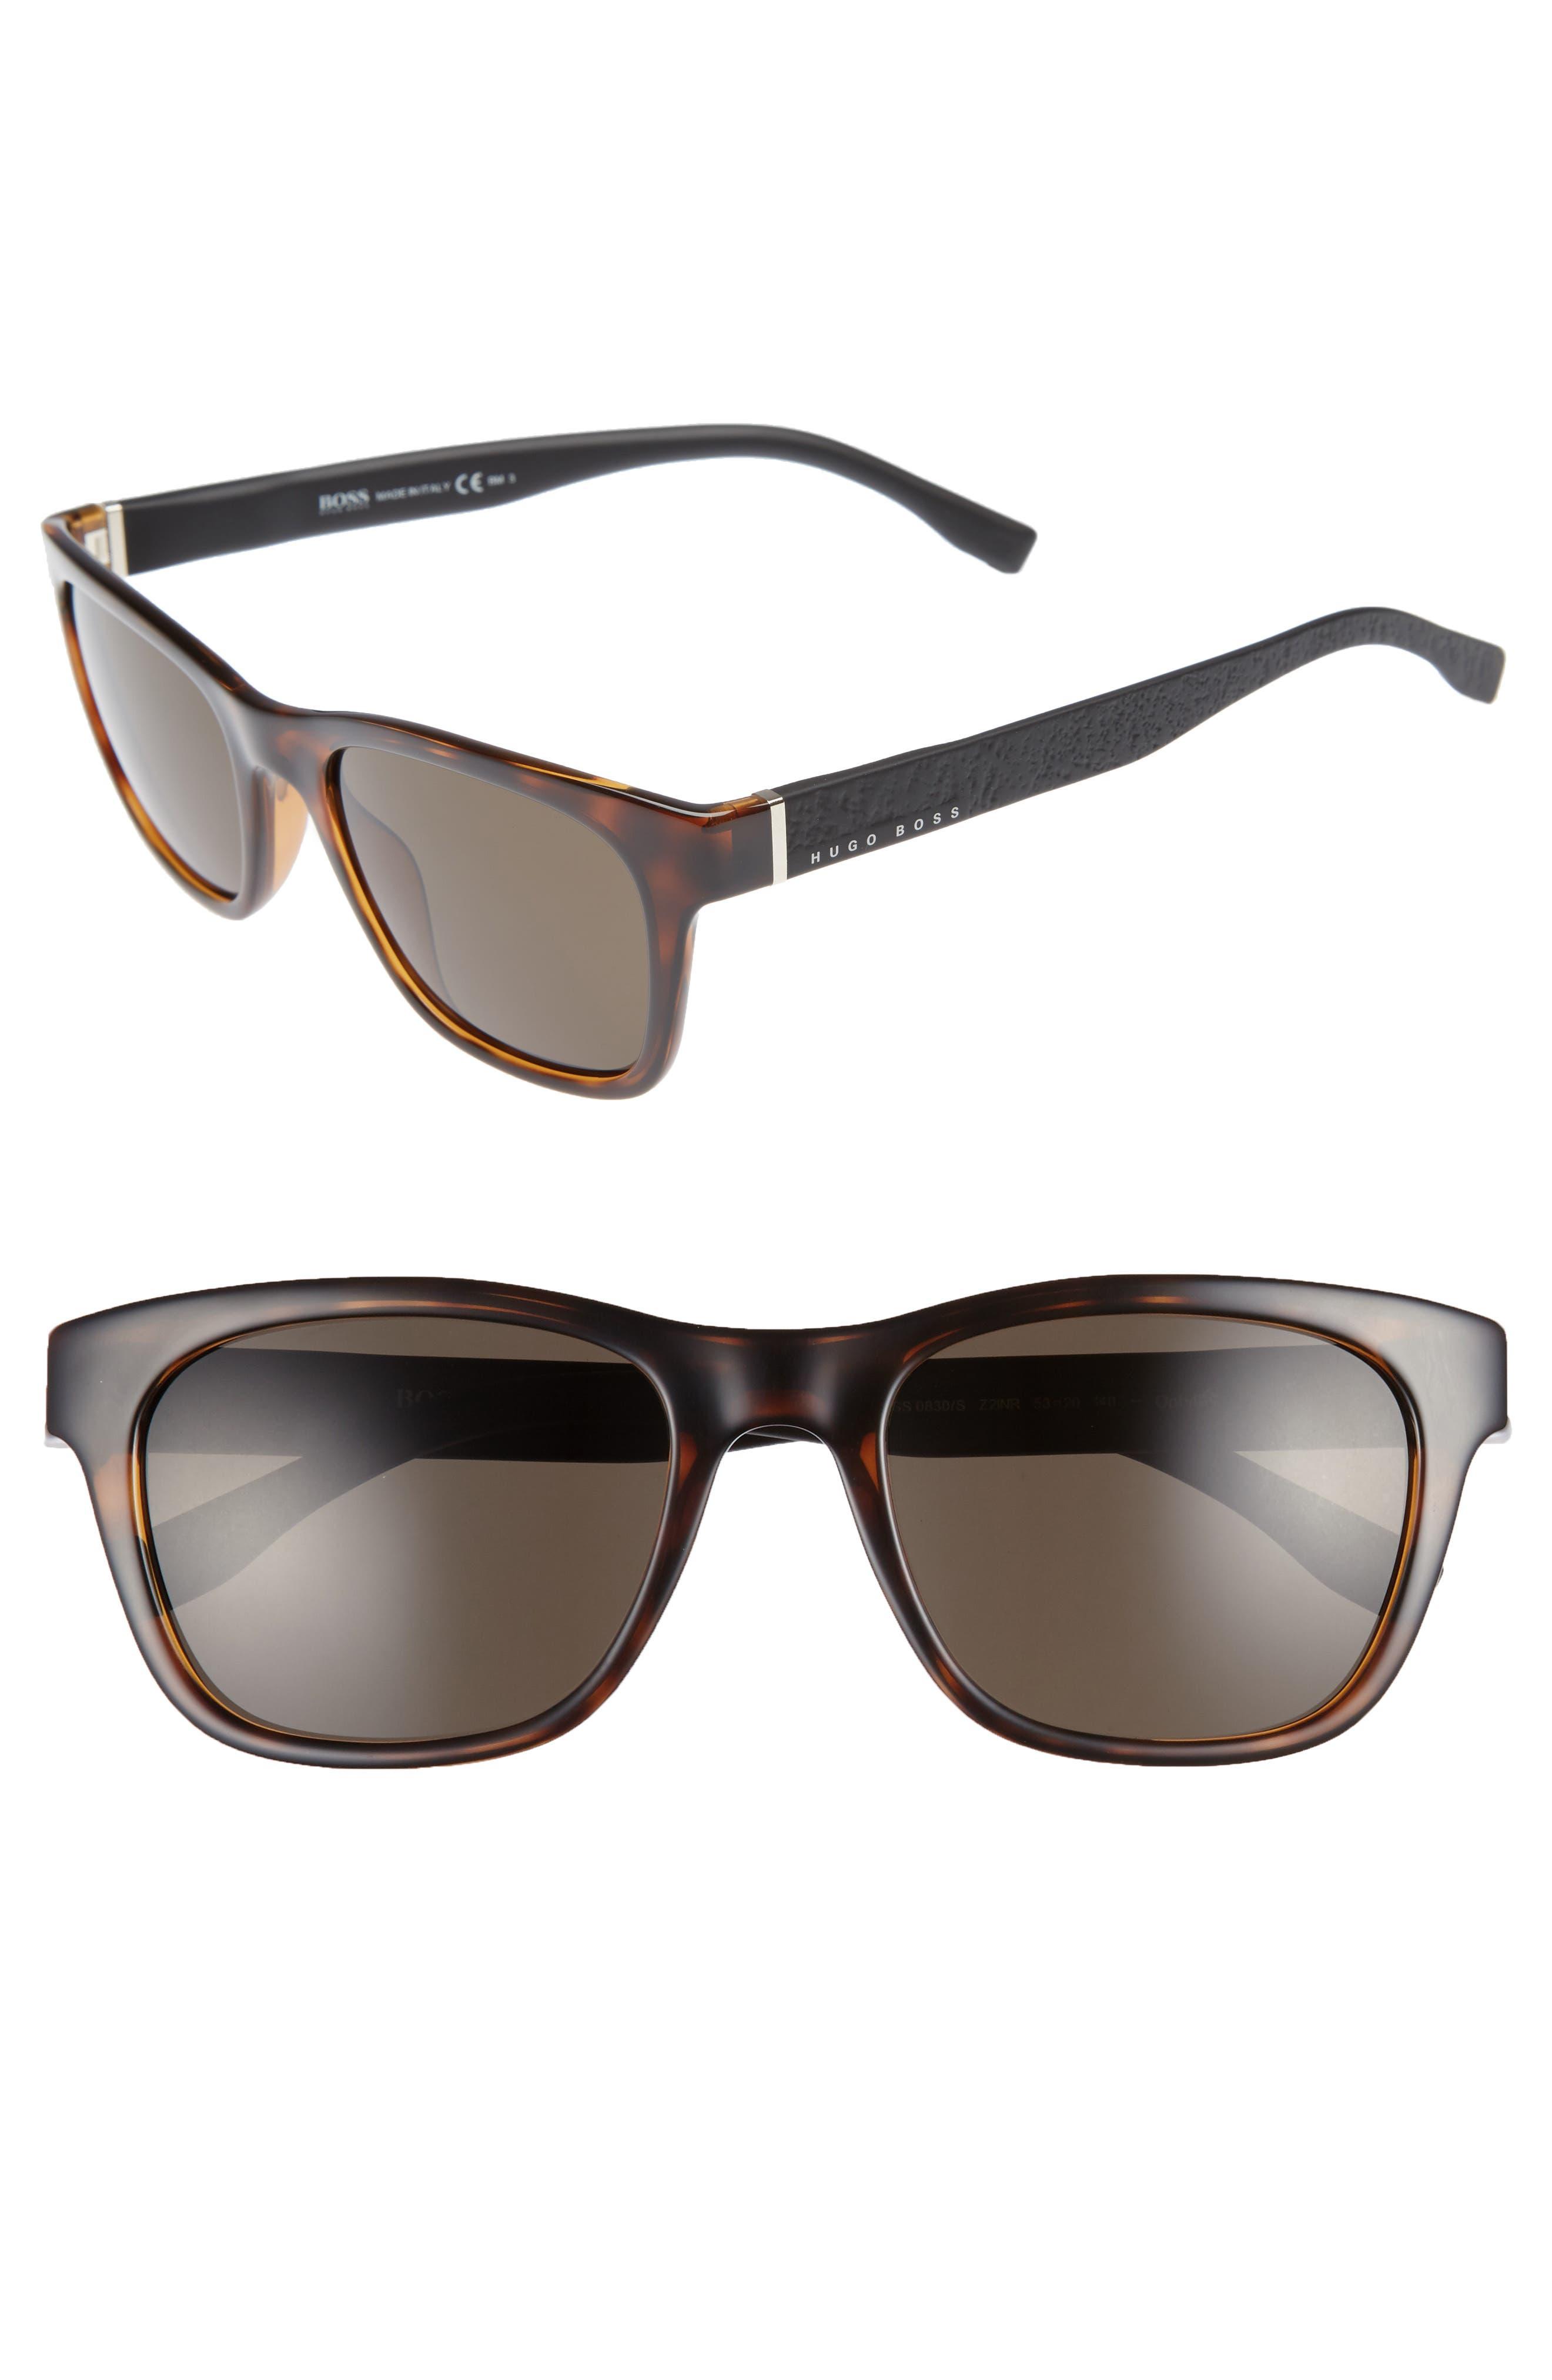 53mm Polarized Sunglasses,                             Main thumbnail 1, color,                             HAVANA BLACK/ BROWN GREY